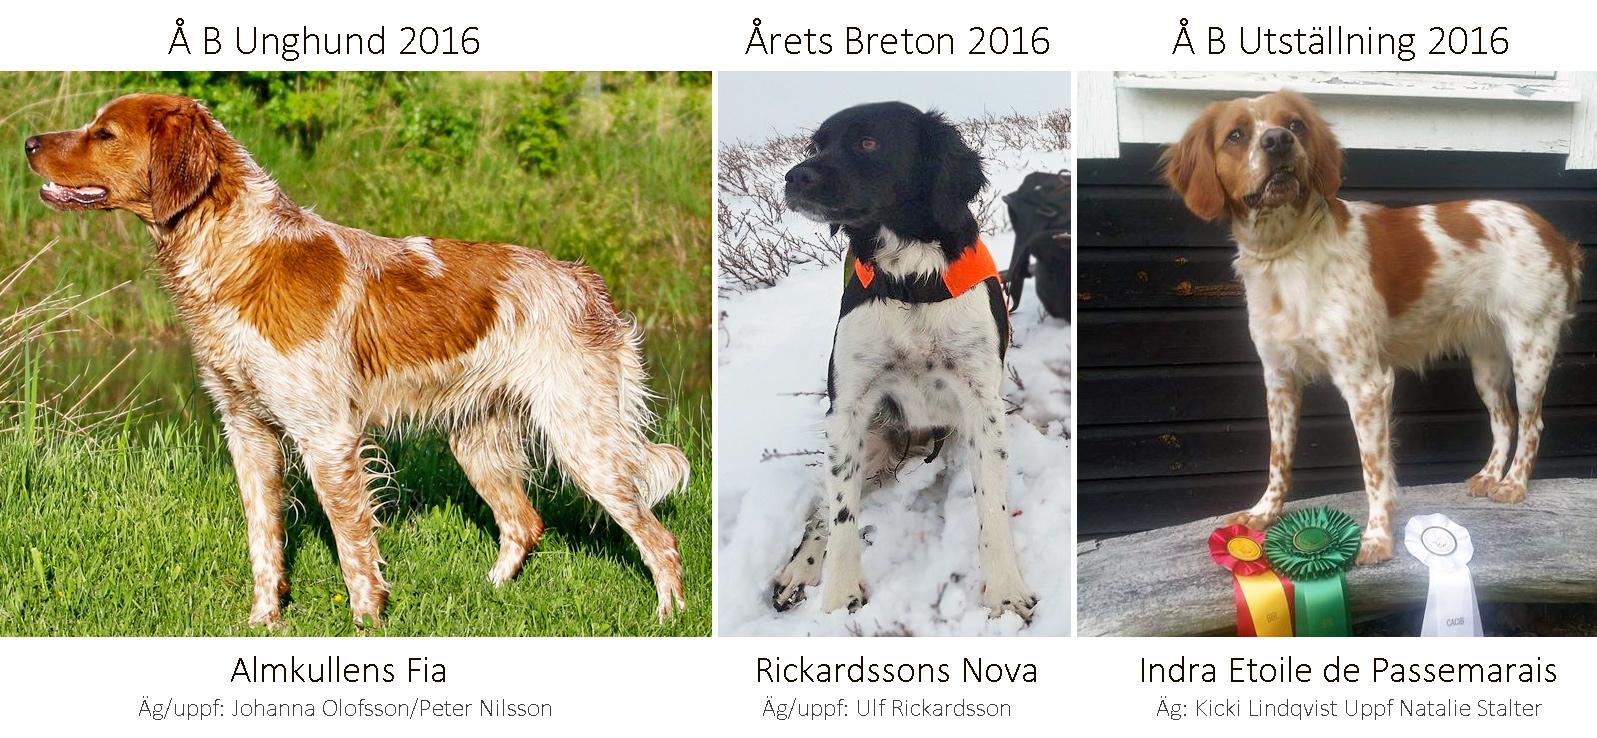 Årets Breton 2016